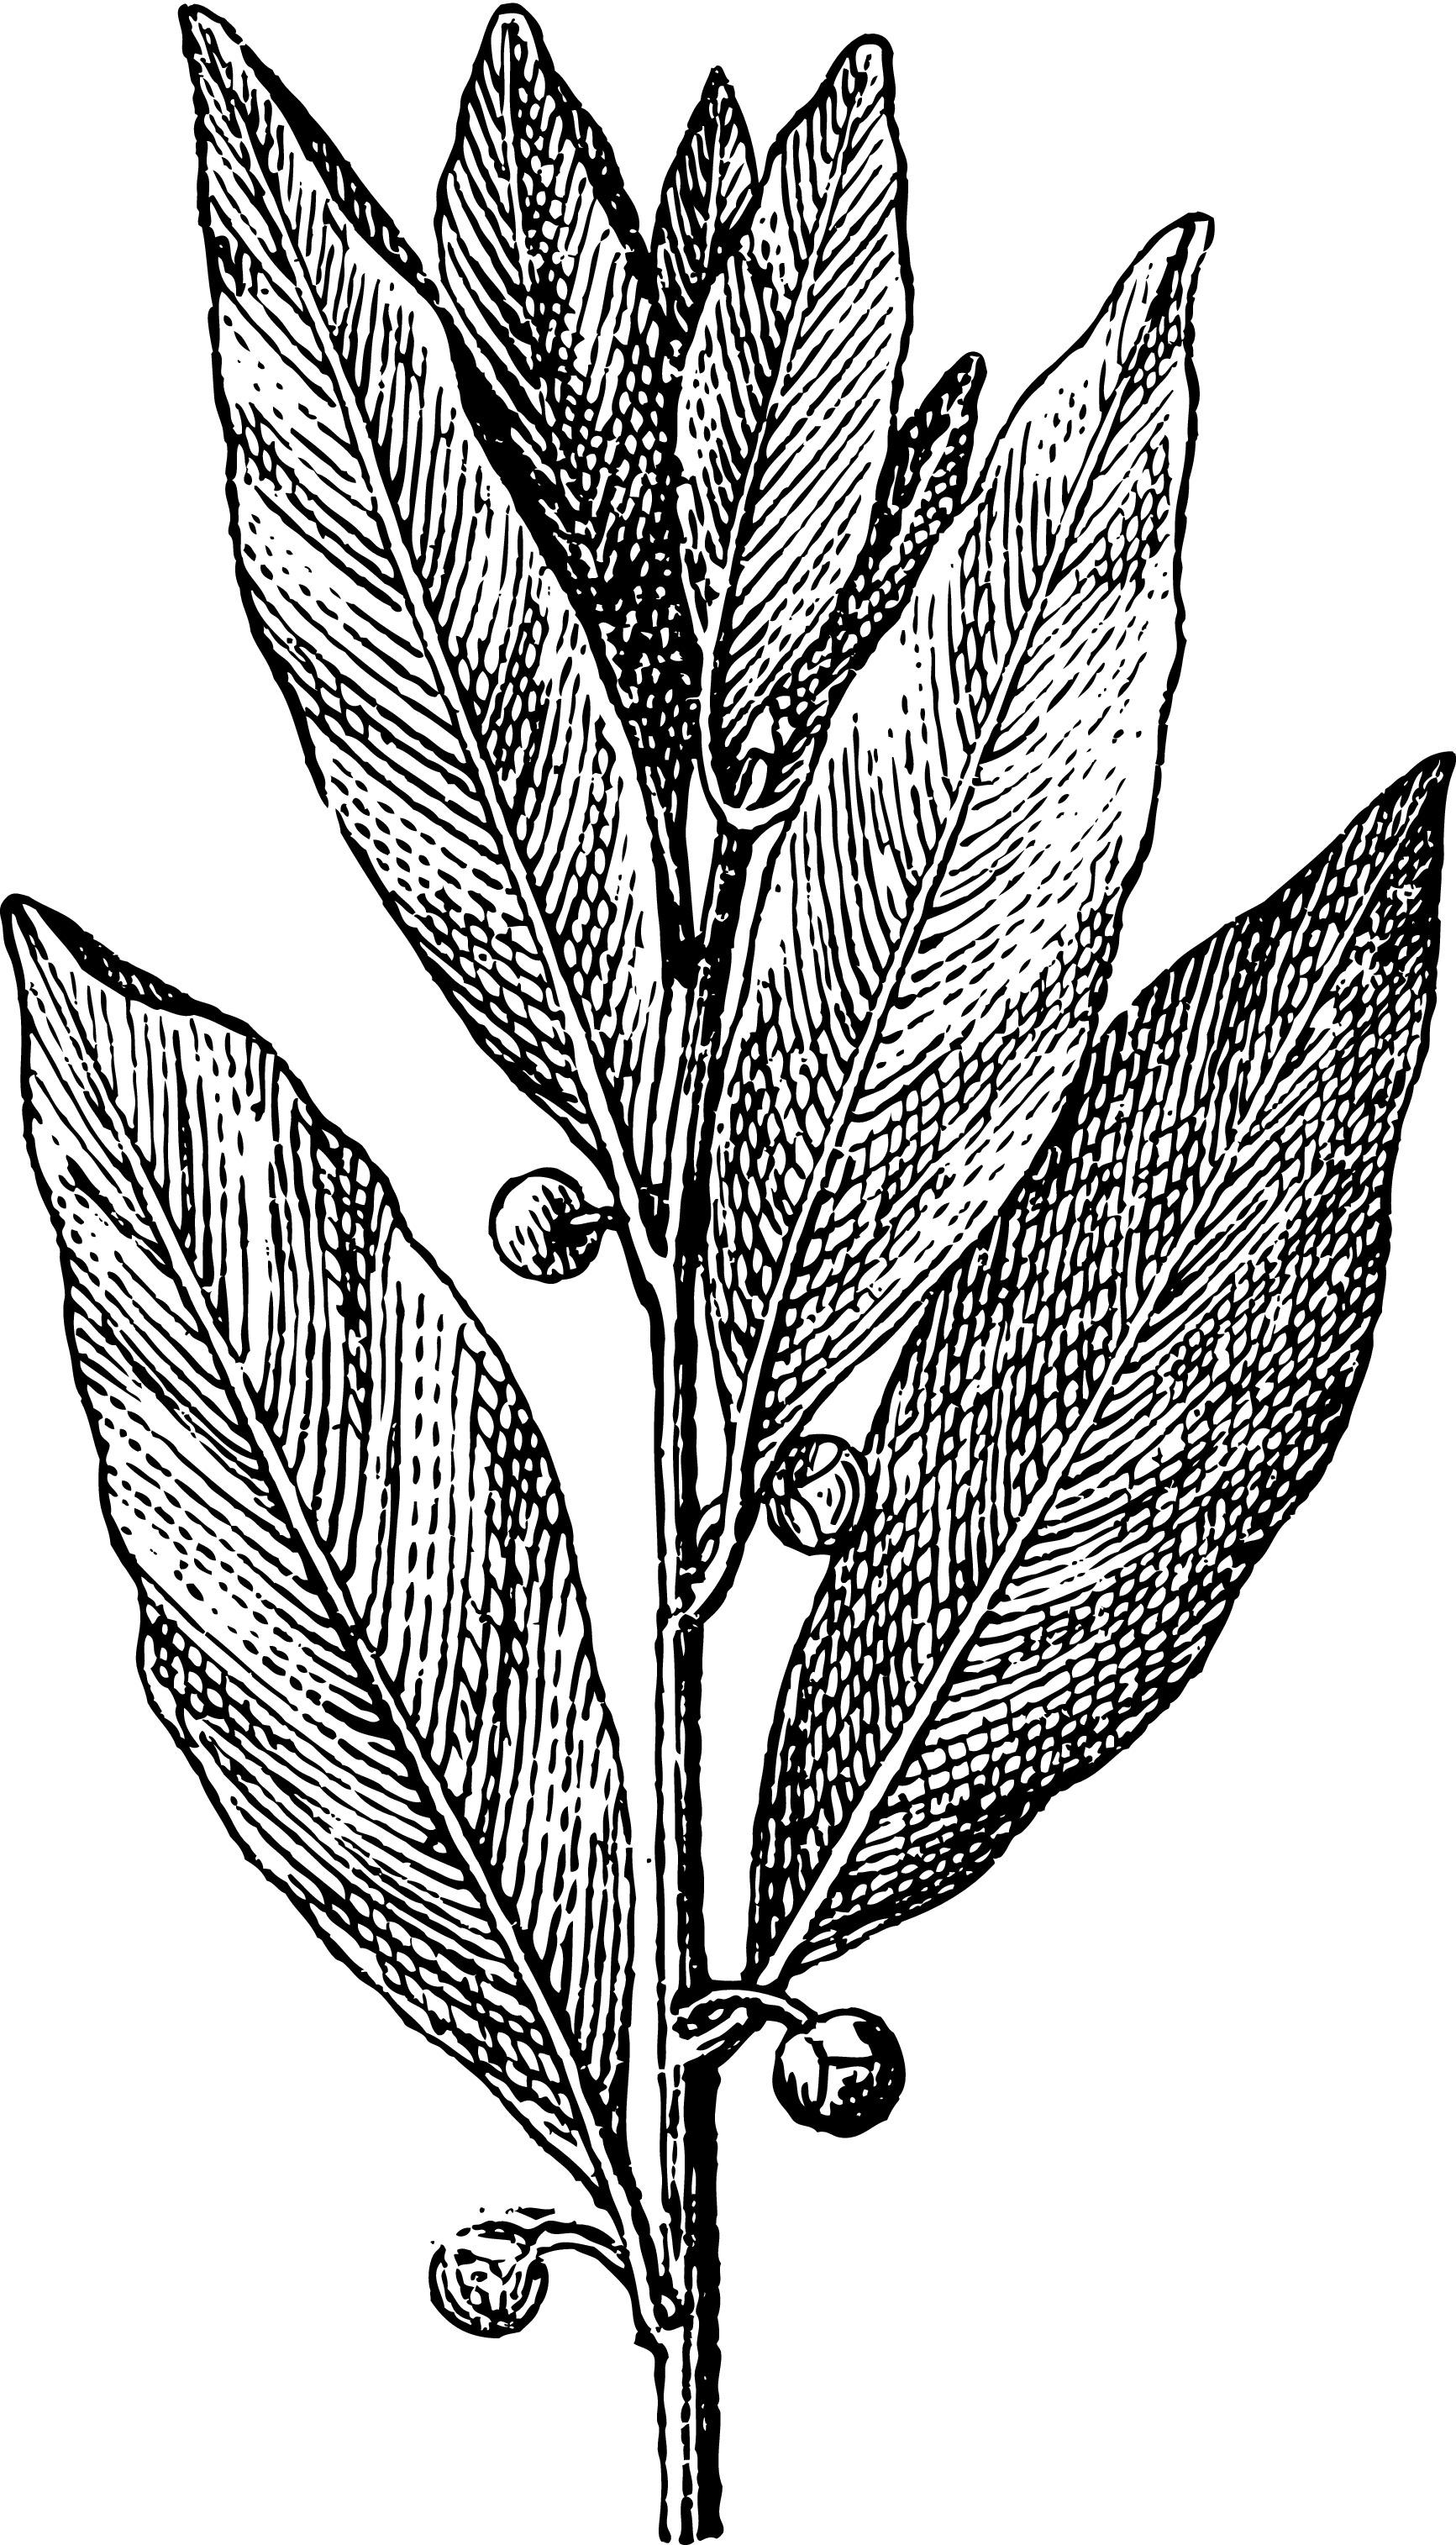 Laurus nobilis engraved illustration (1895)